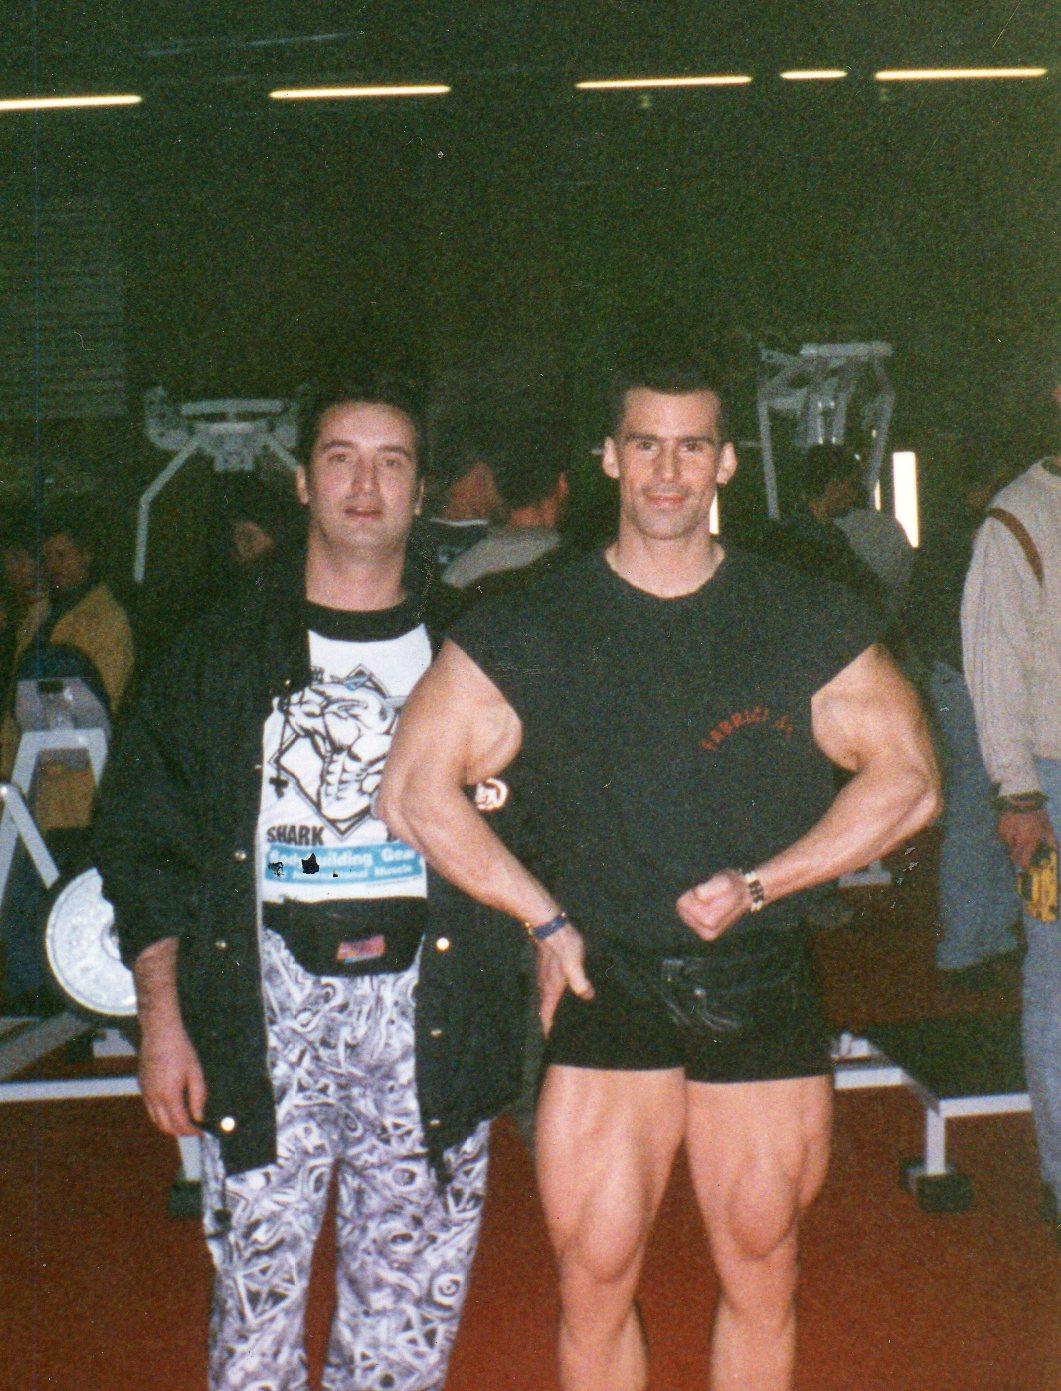 http://images.onlc.eu/muscle-catrinOEU//13060801125.jpg